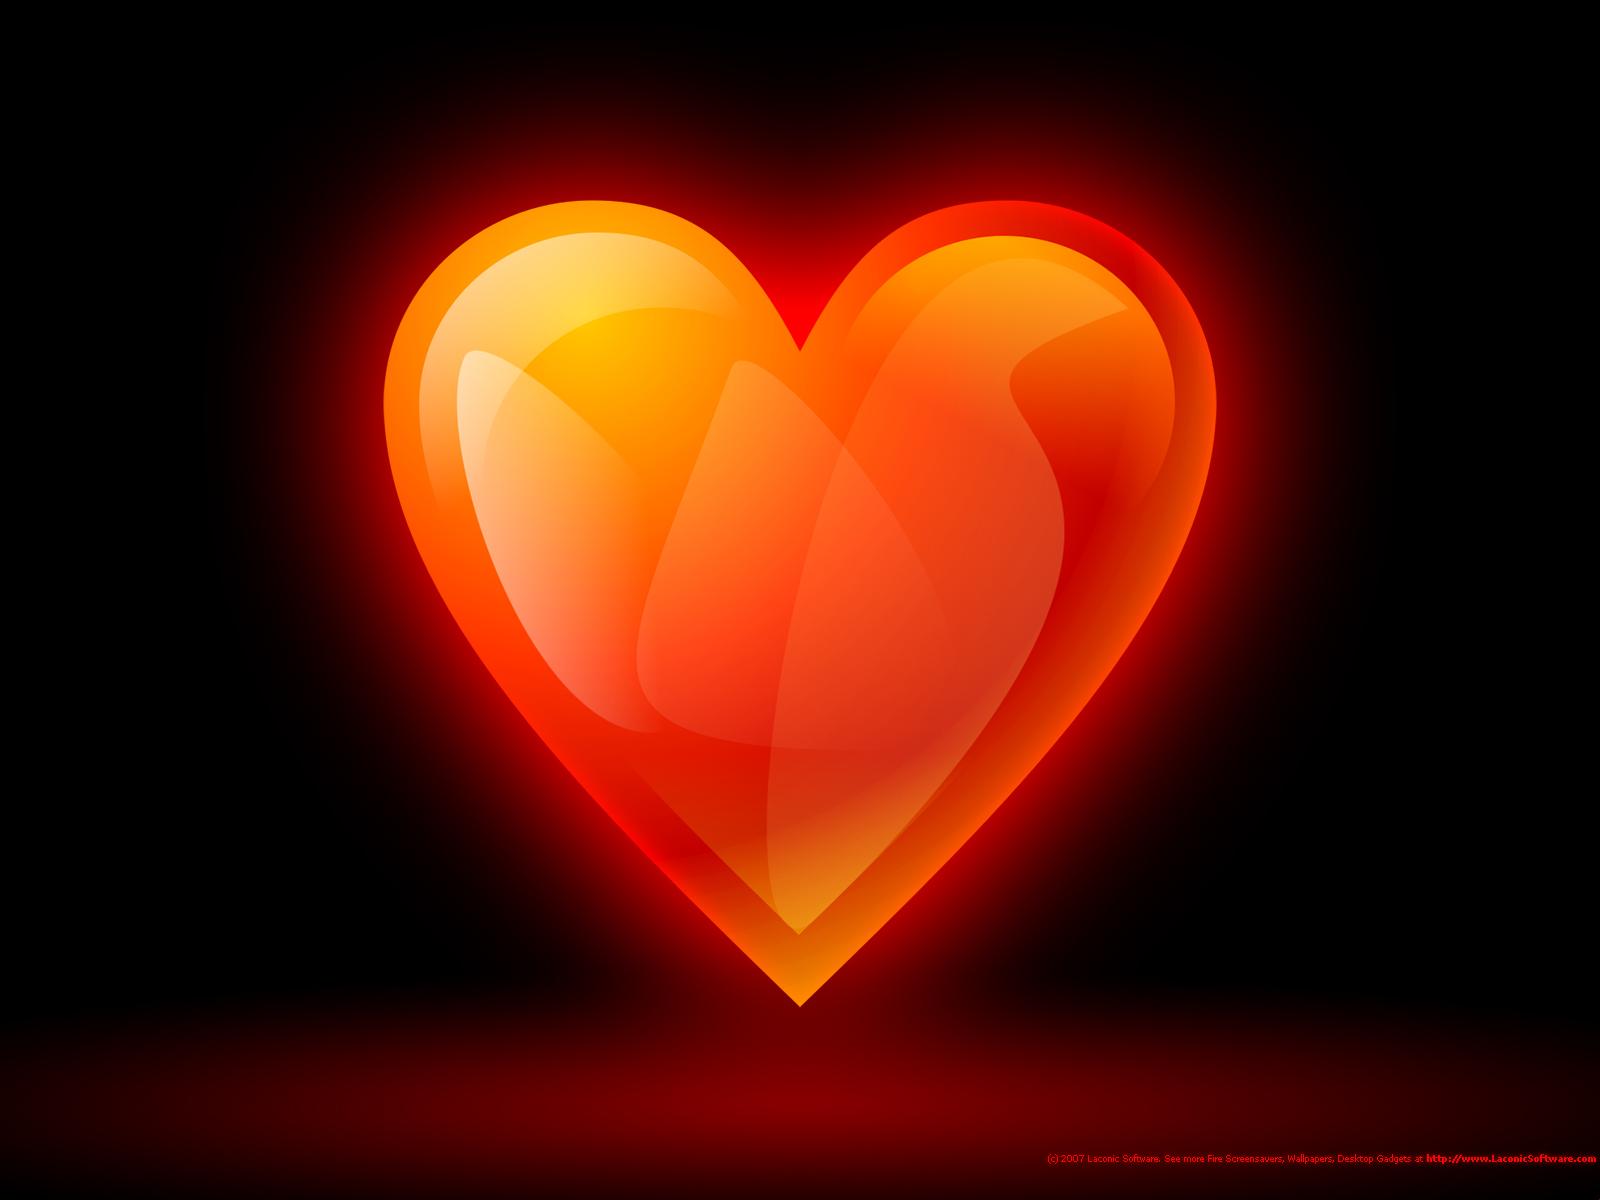 http://3.bp.blogspot.com/-b3nMOeQ_UJ0/UD5I9e1wv4I/AAAAAAAABQI/SpKM-hI_vAA/s1600/heart-of-flame-wallpaper-1600x1200.jpg